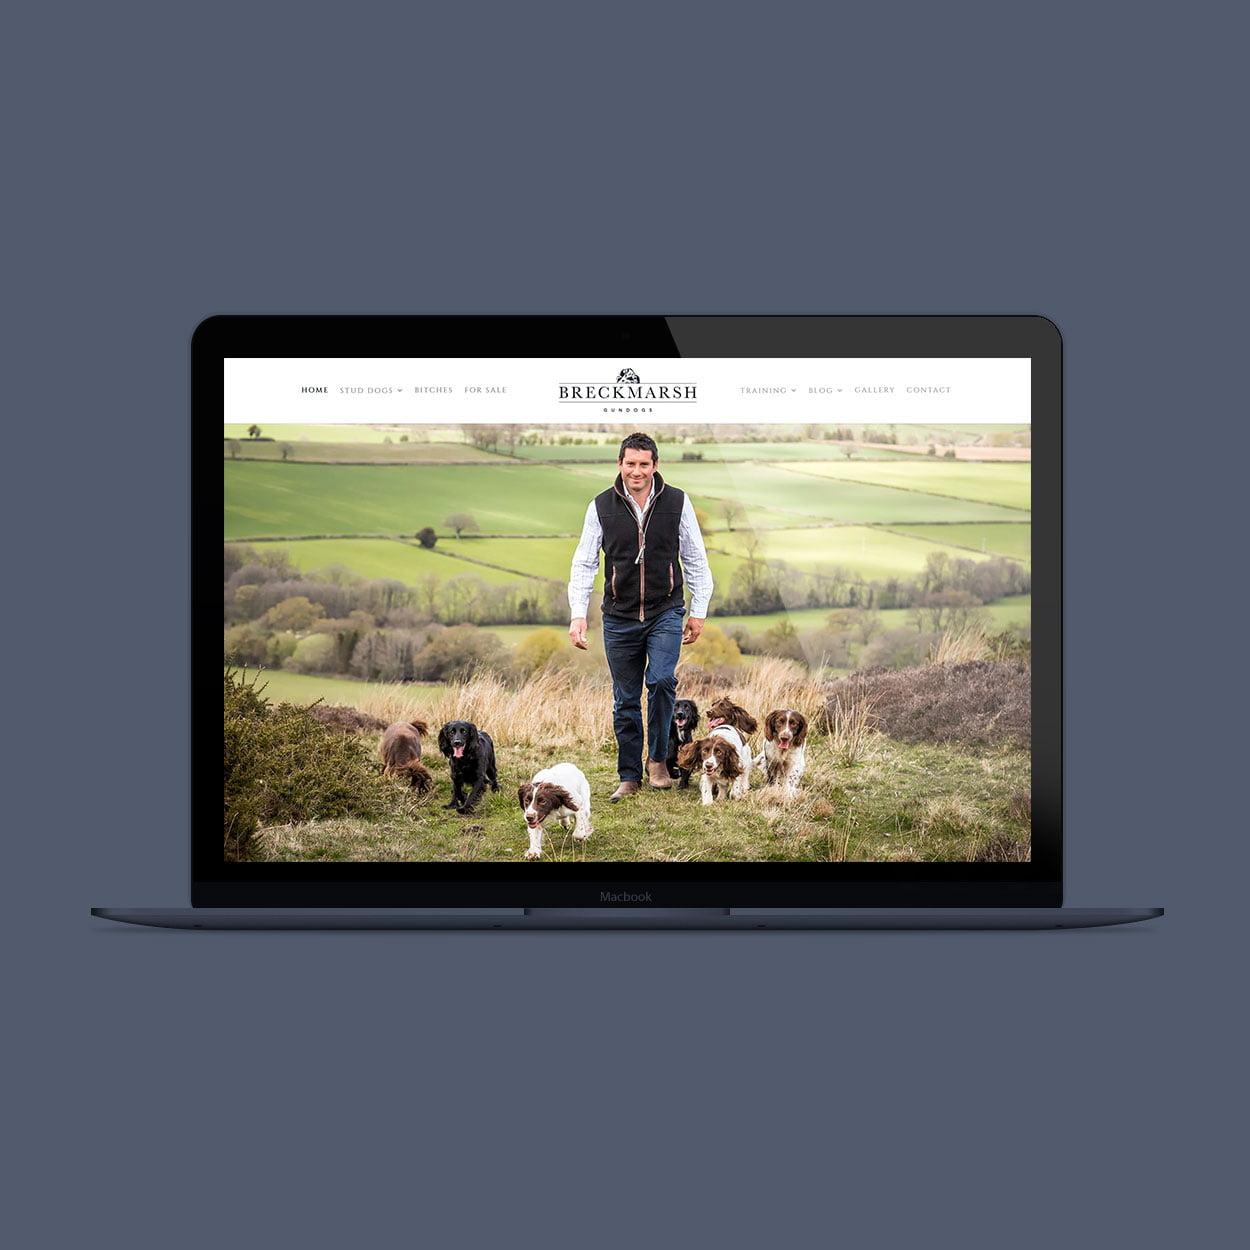 Breckmarsh Gundogs website design